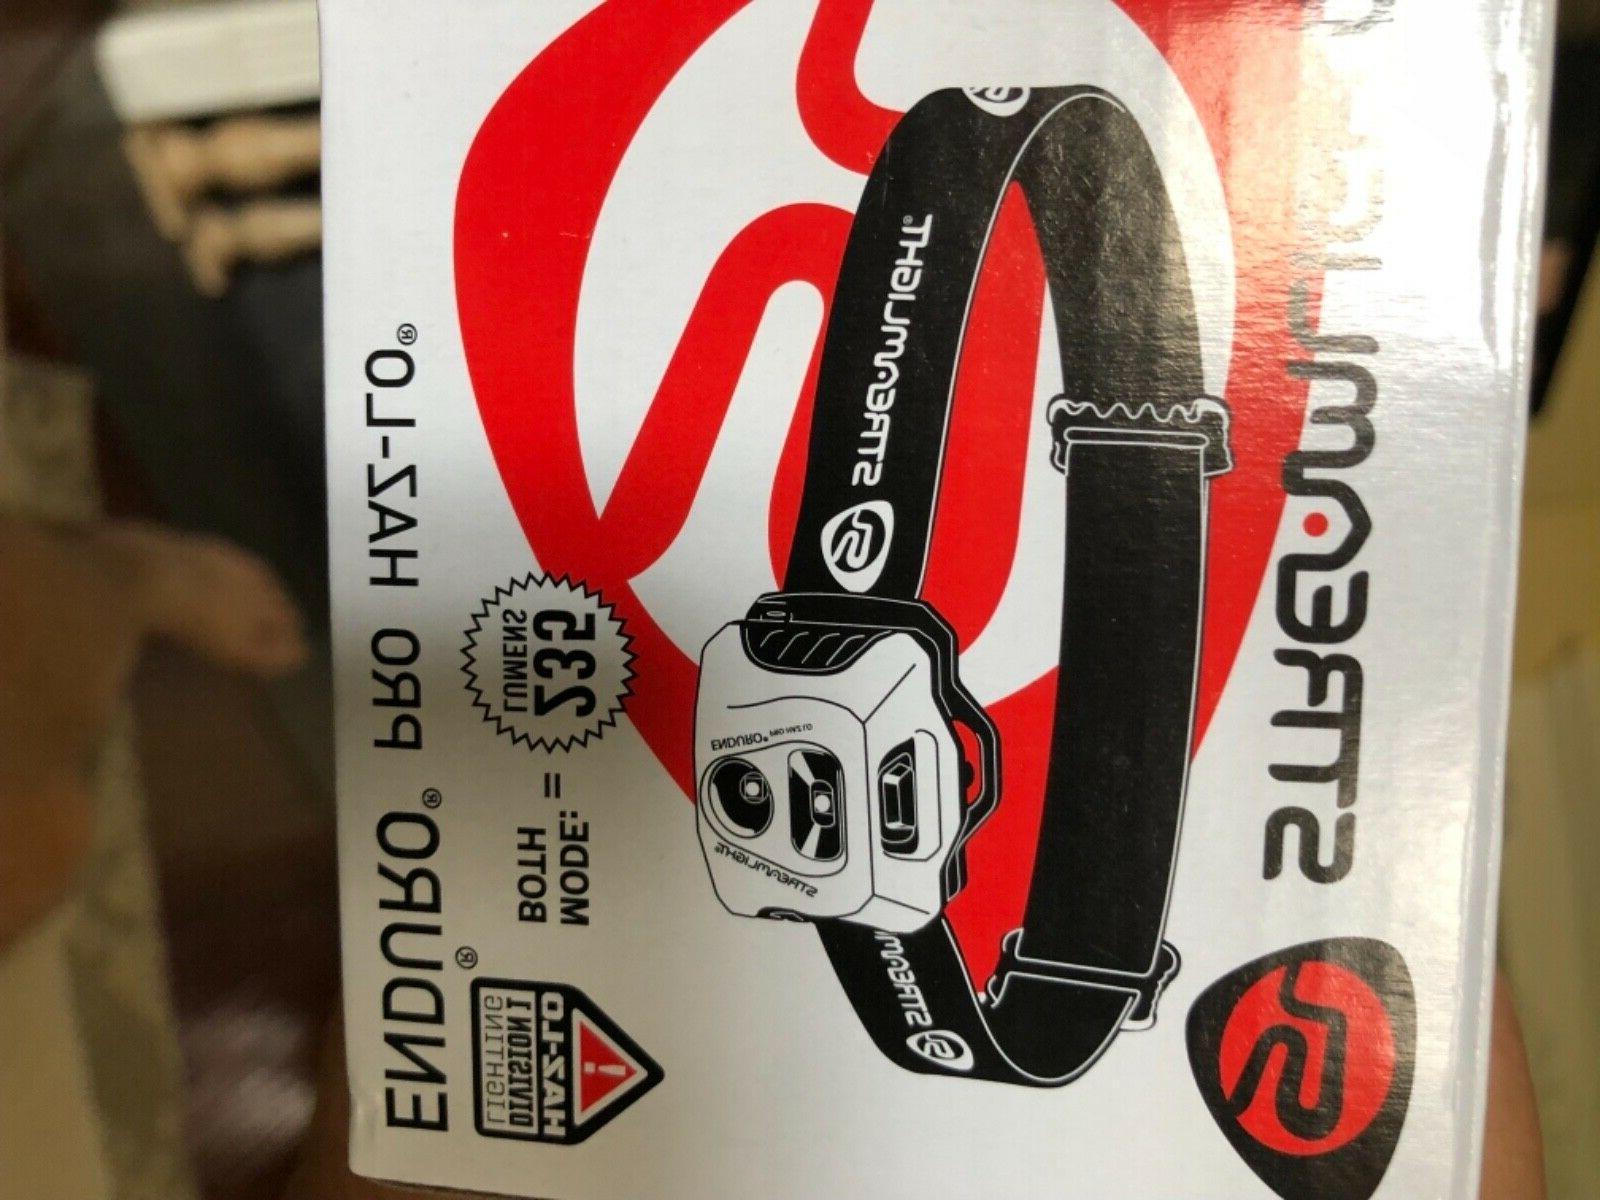 61421 enduro pro headlamp 3 aaa elastic